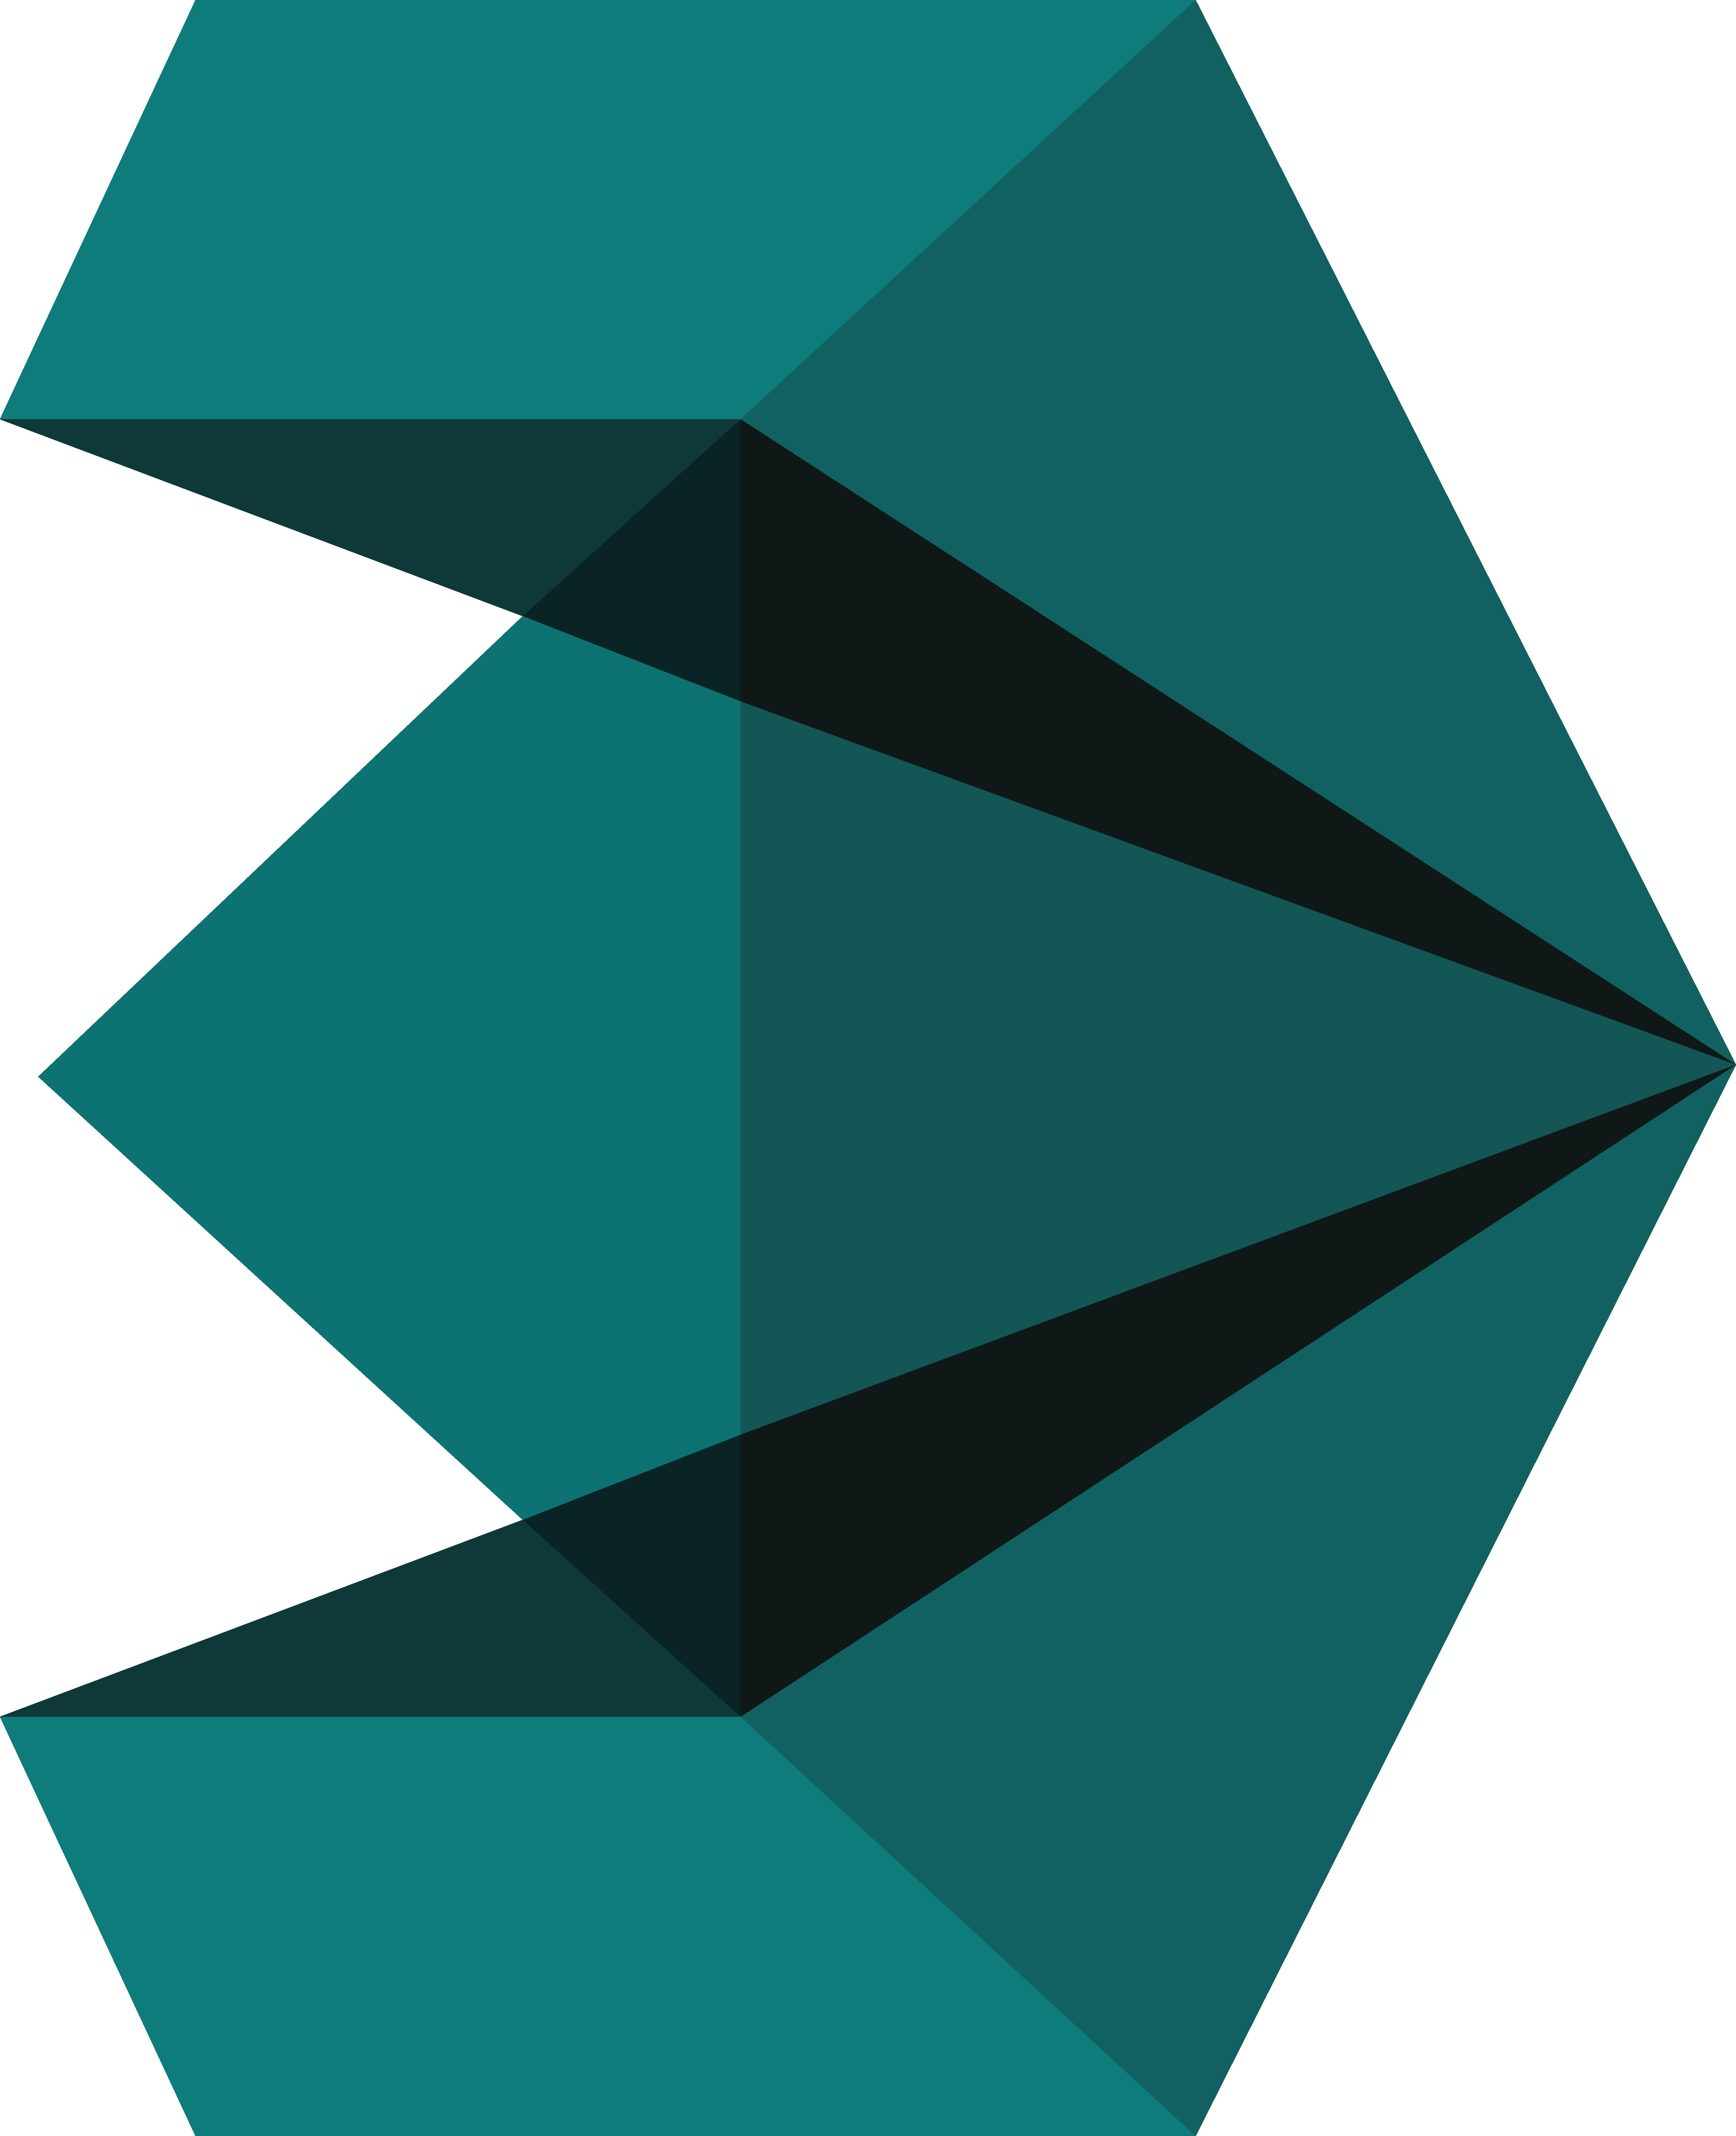 autodesk 3d studio max 2014 logo by thegamerx8469 on